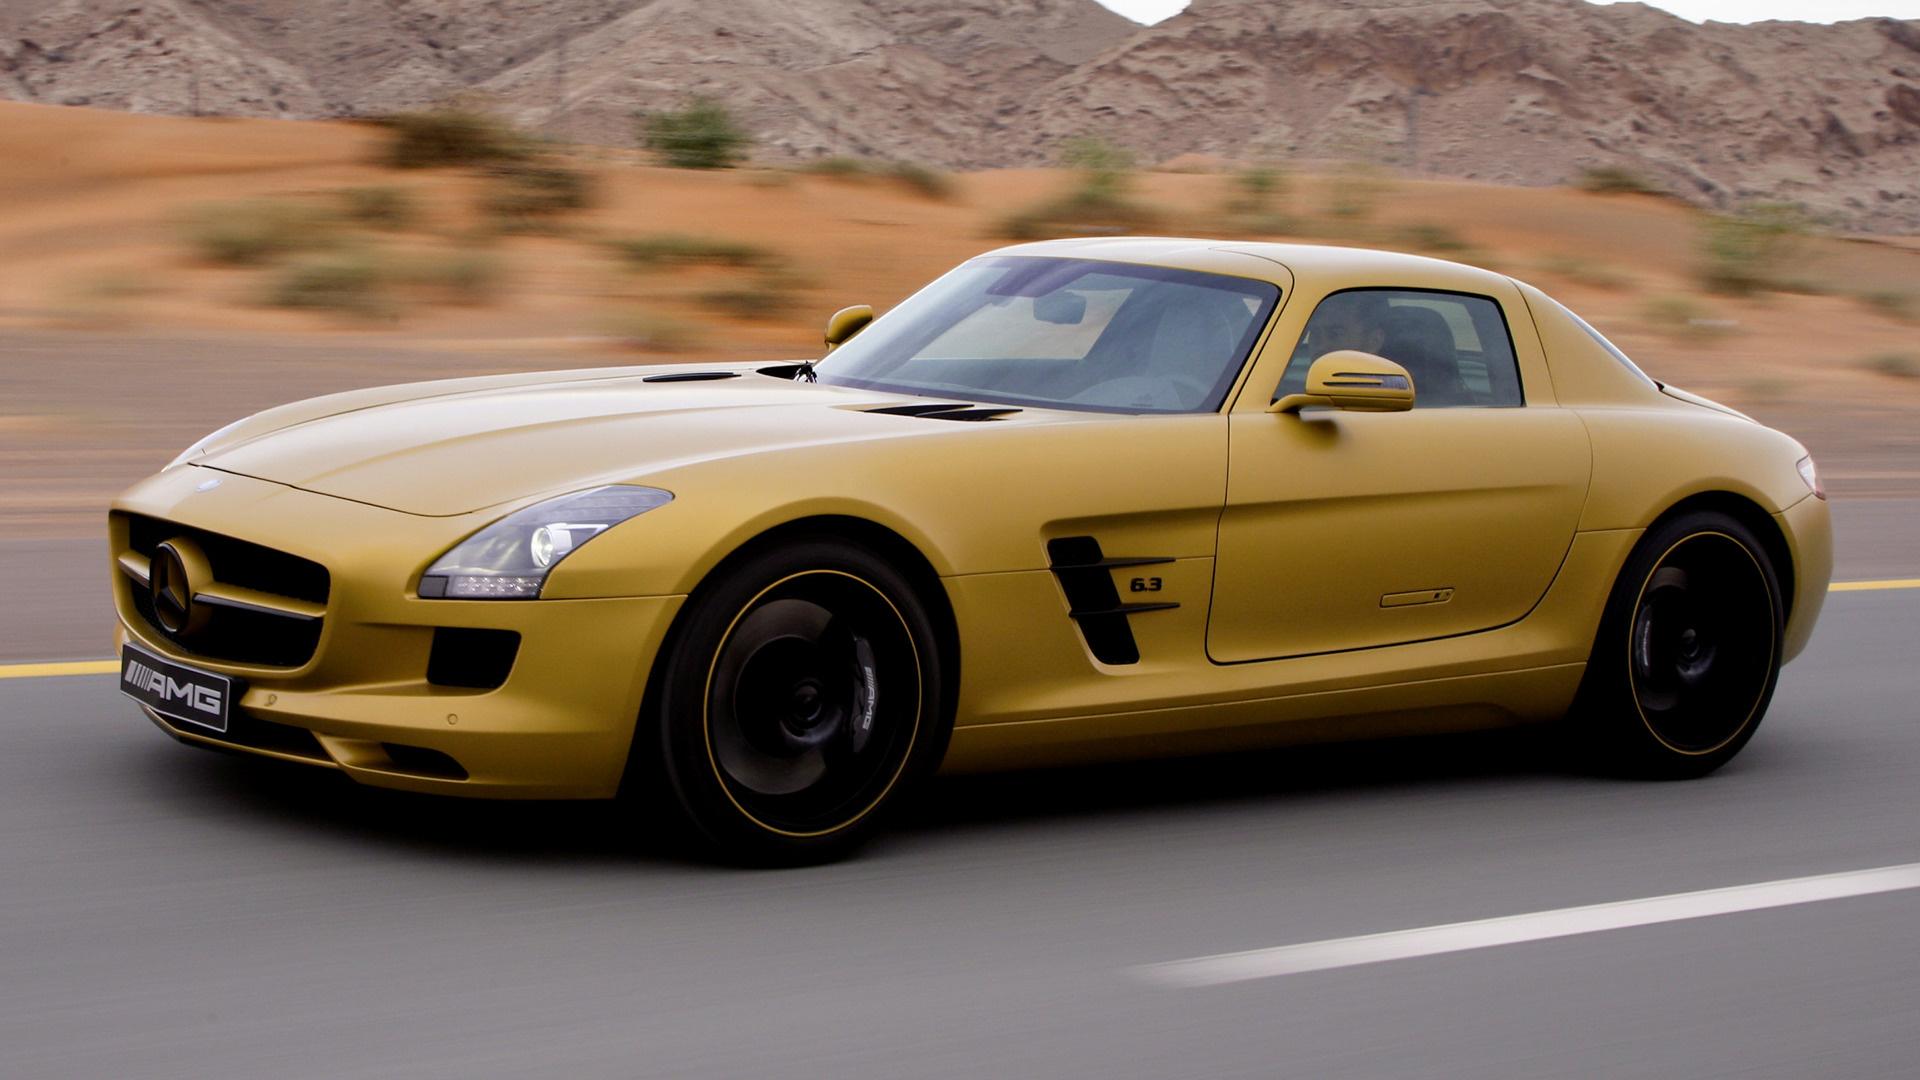 2010 Mercedes-Benz SLS AMG Desert Gold - Wallpapers and HD ...